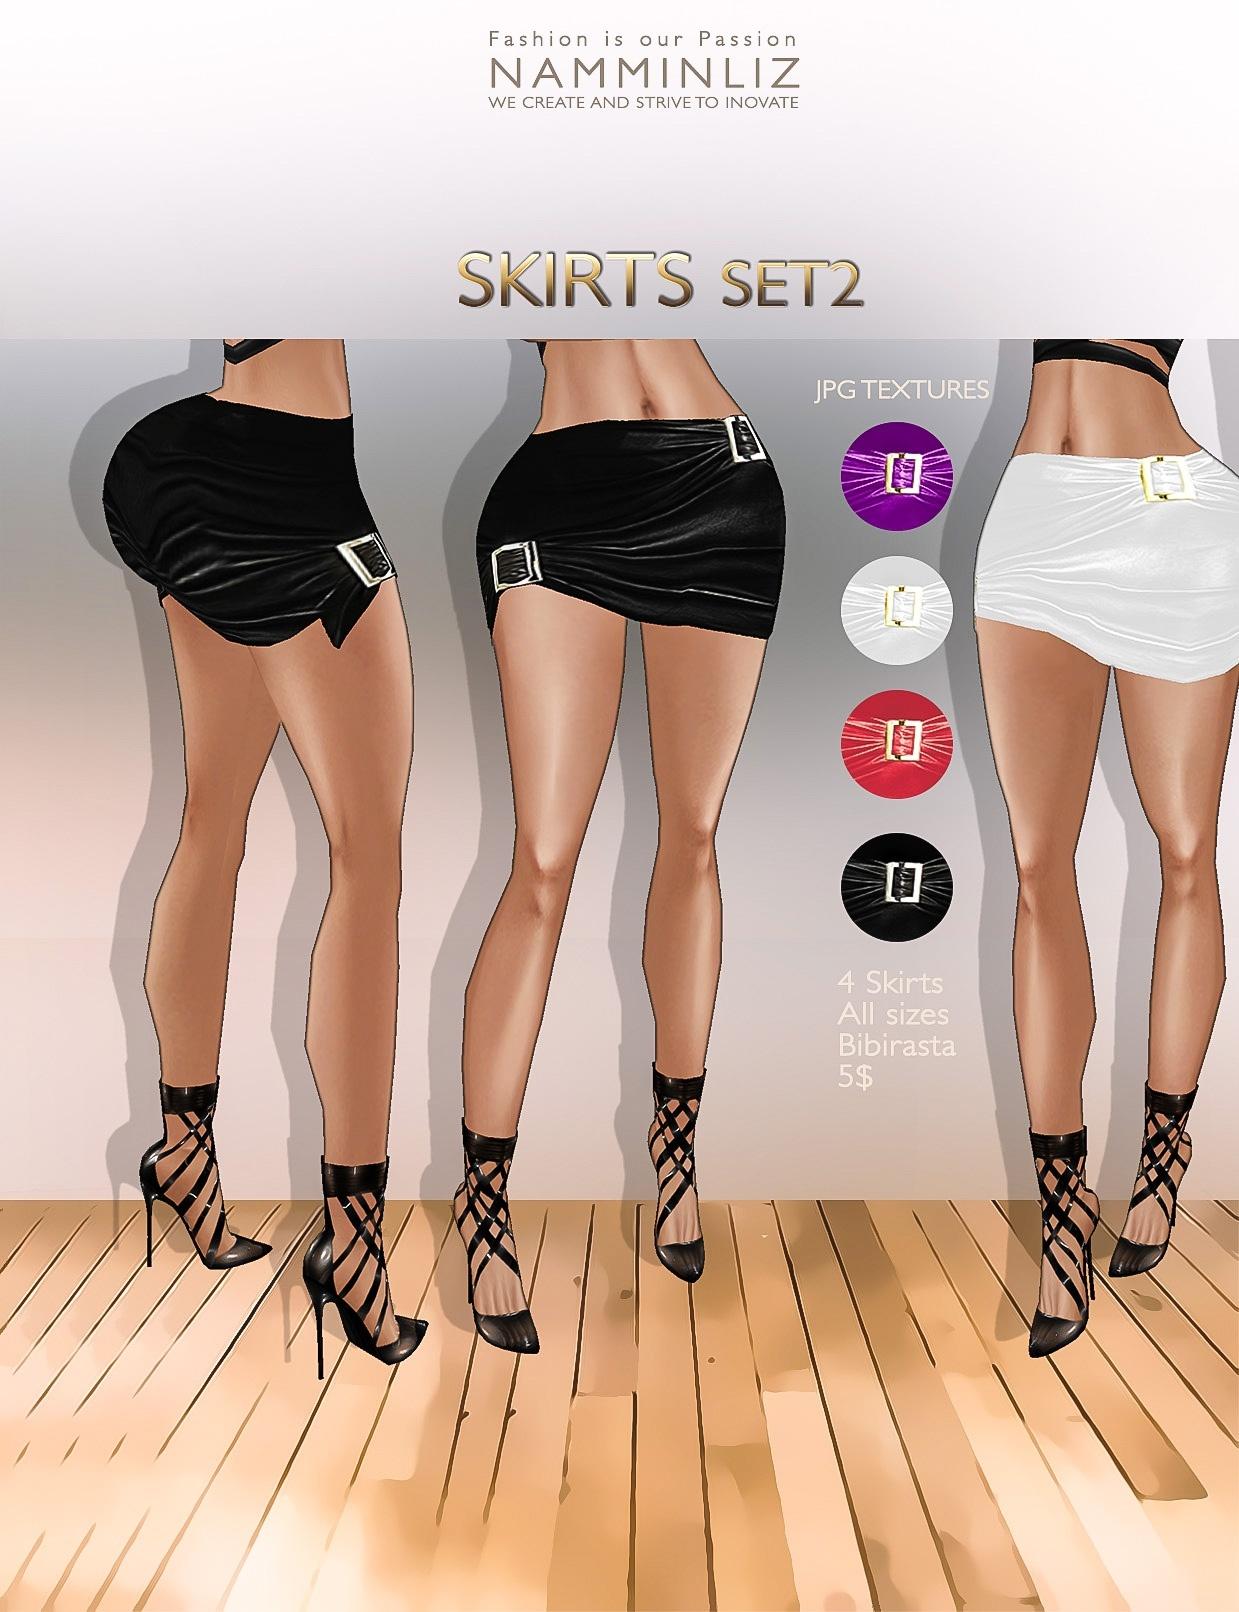 Skirts Set2 ( 4 colors imvu textures Bibirasta )